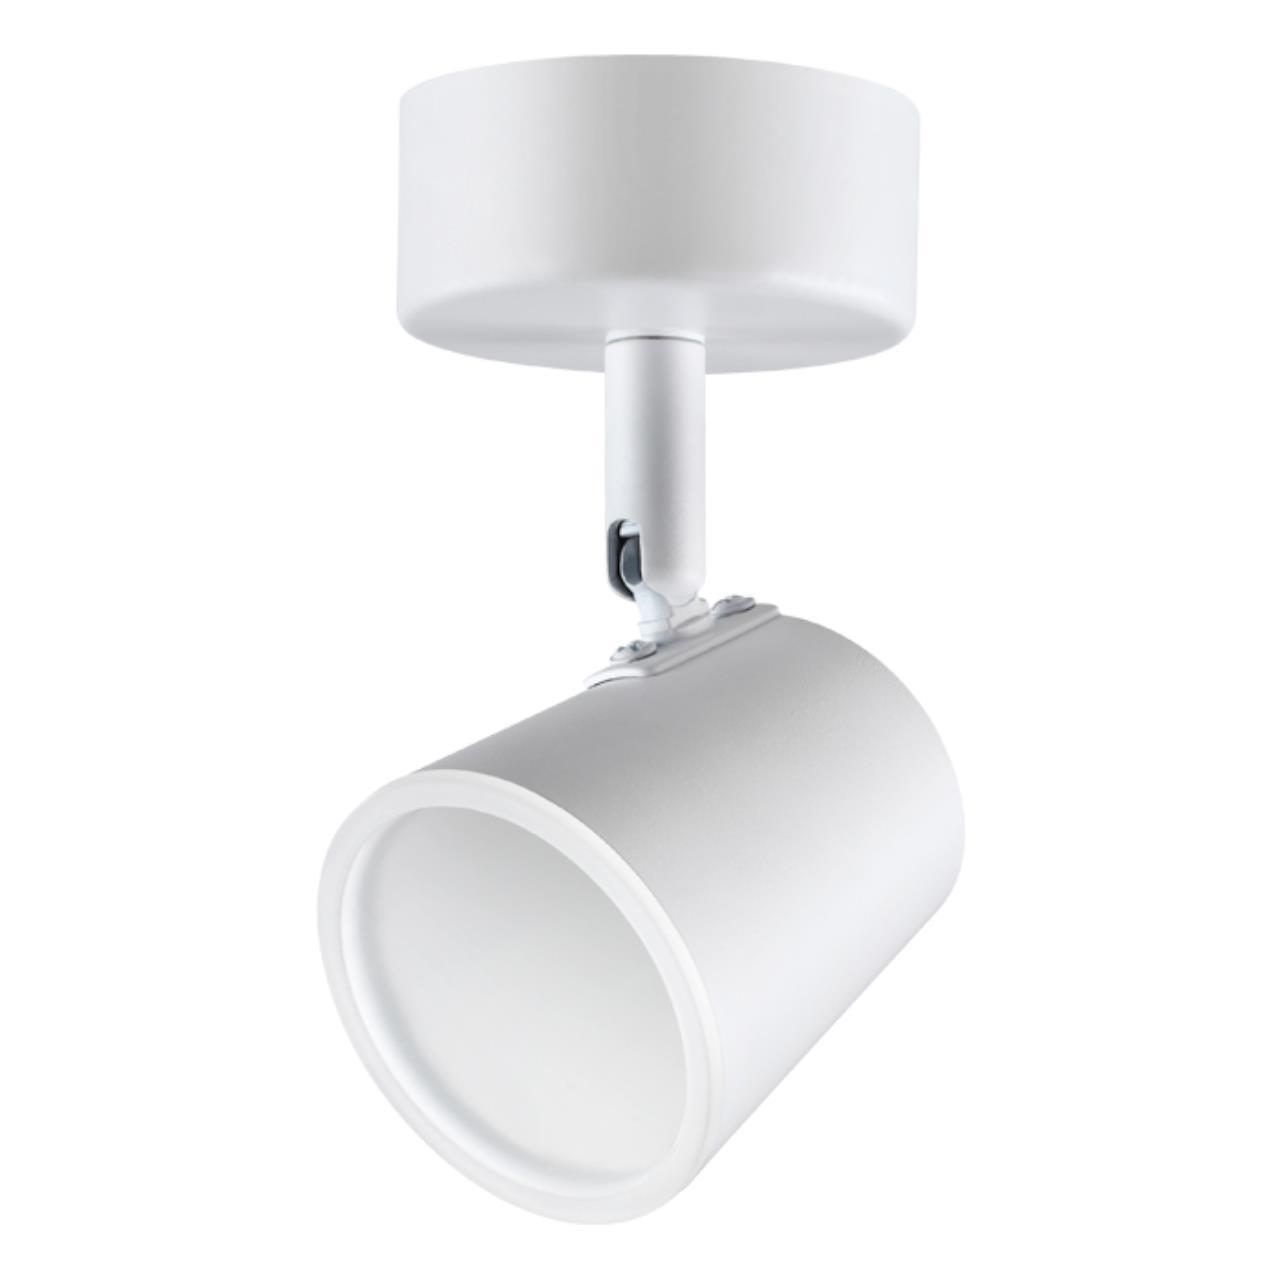 357852 OVER NT18 0062 белый Накладной светильник IP20 LED 3000К 6W 110-240V CAMPANA